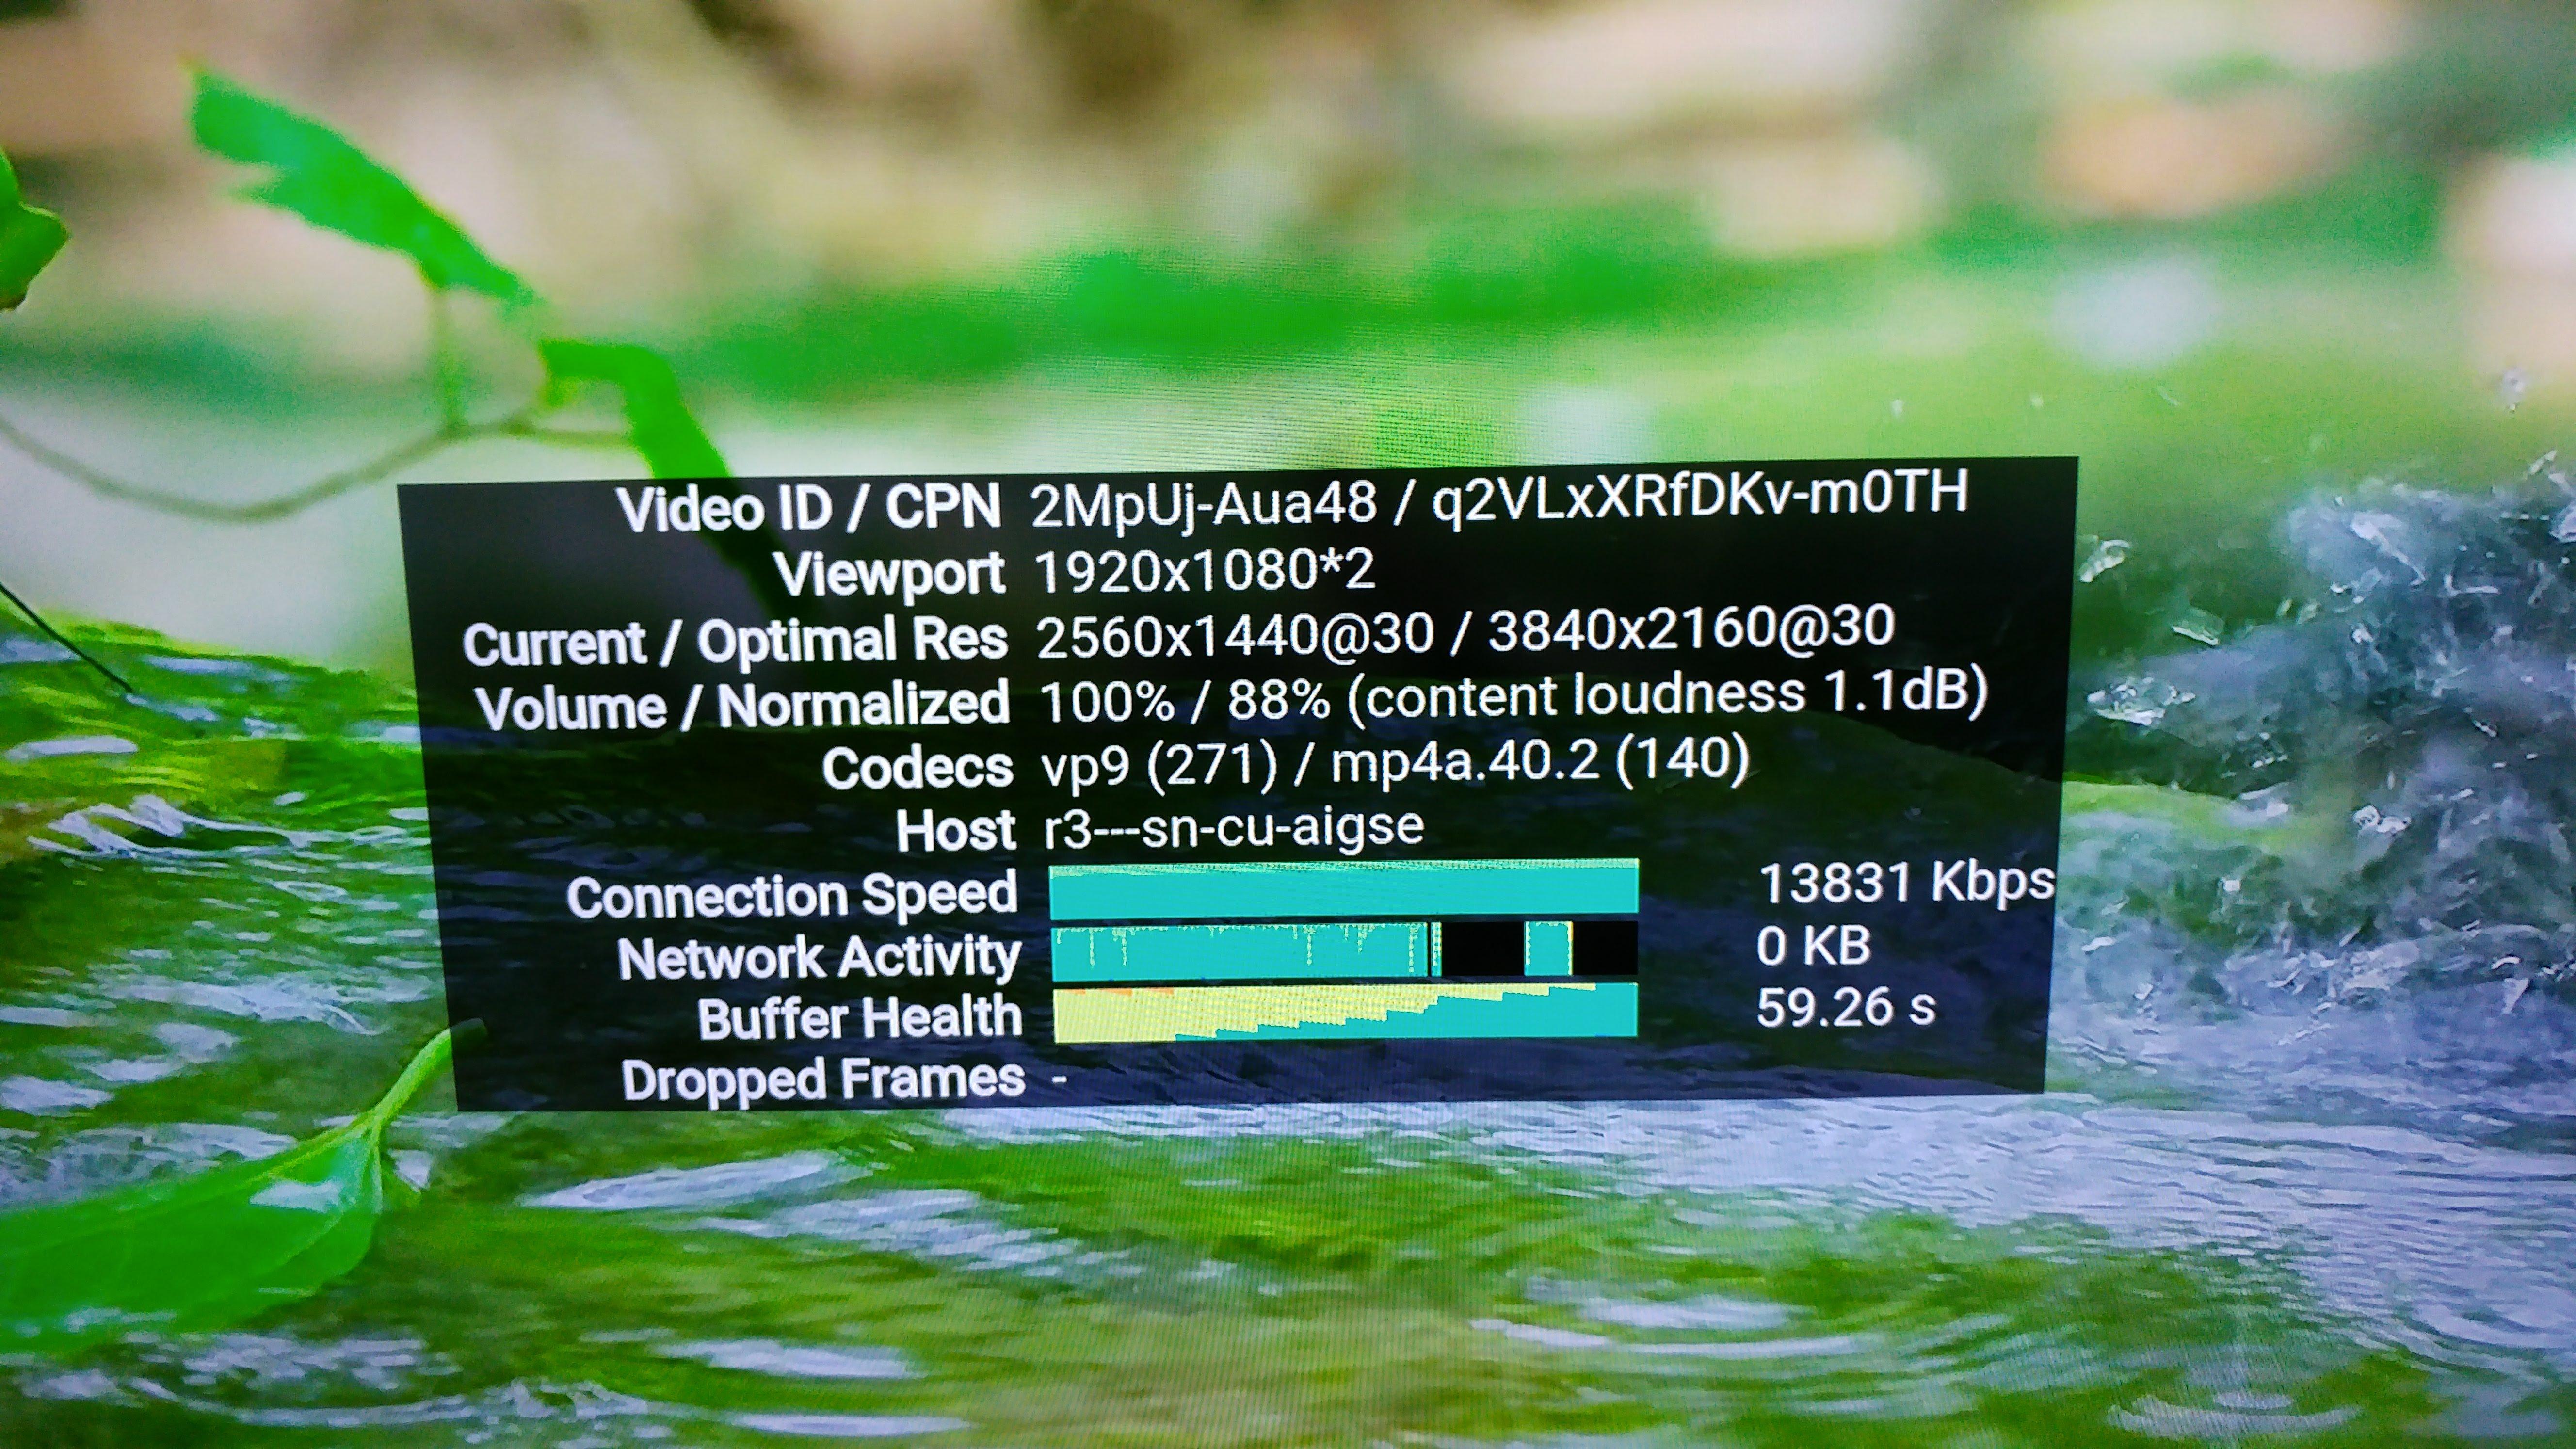 Question - 4k YouTube on Samsung TV | AVForums